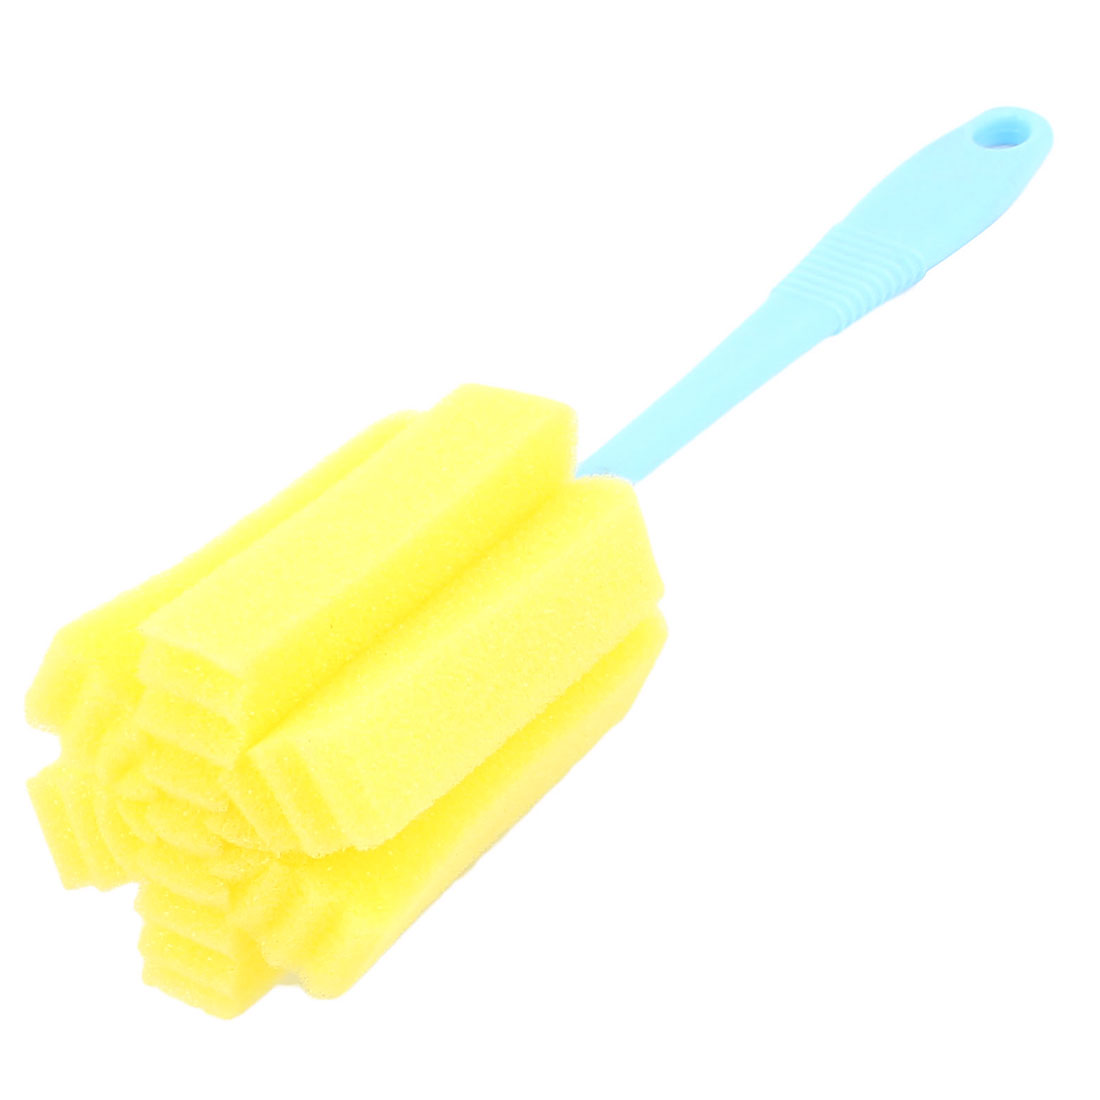 Yellow Sponge 360 Degree Swivel Glass Bottle Tube Cup Cleaning Washing Brush 24.5cm Length